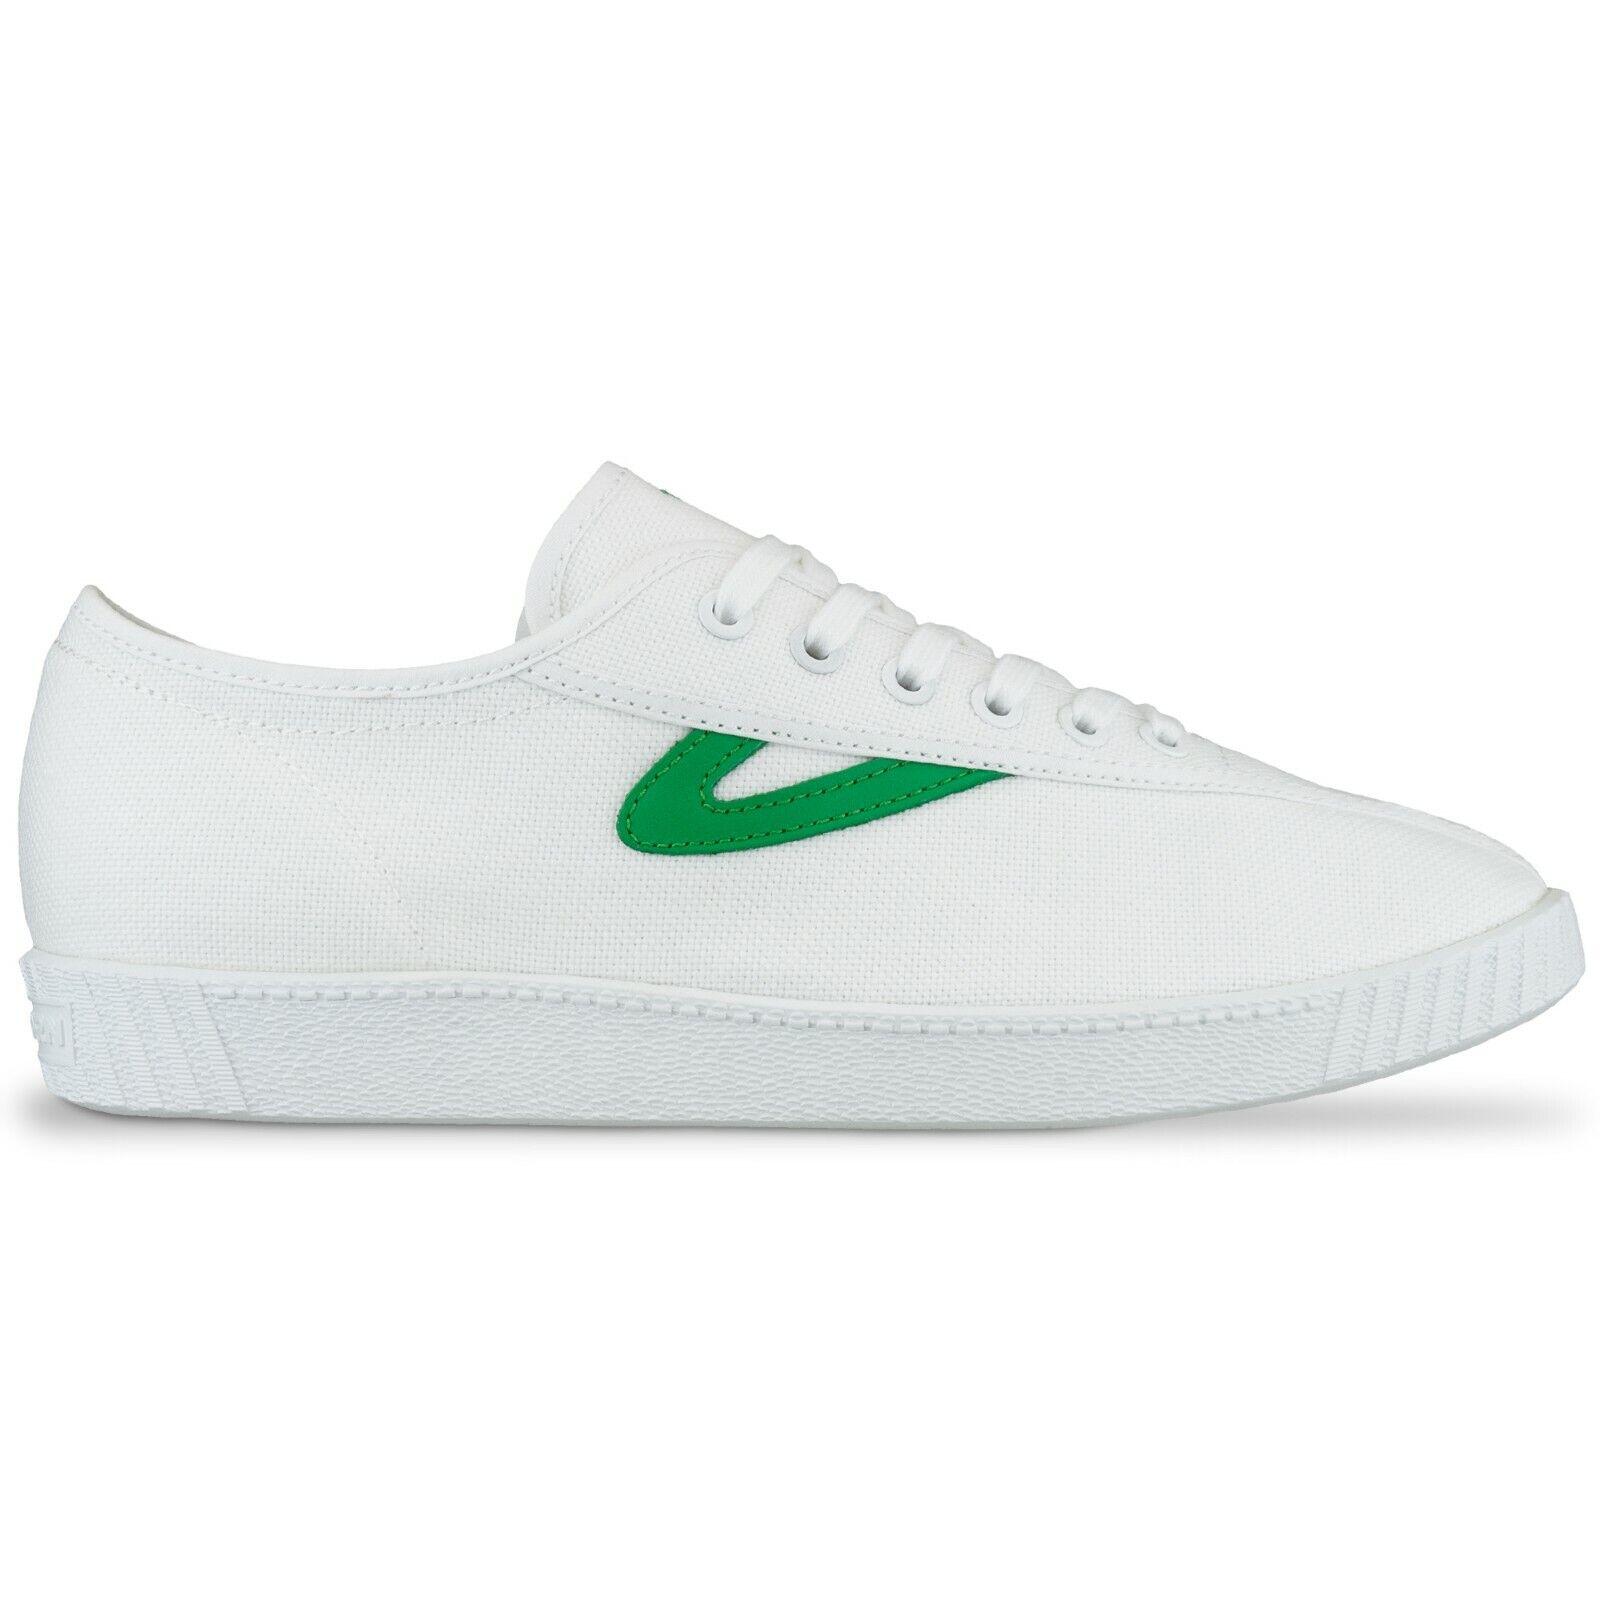 Tretorn Trainers - Tretorn Nylite Canvas Trainers - - - nero, bianca, verde - BNIB c8d7a9